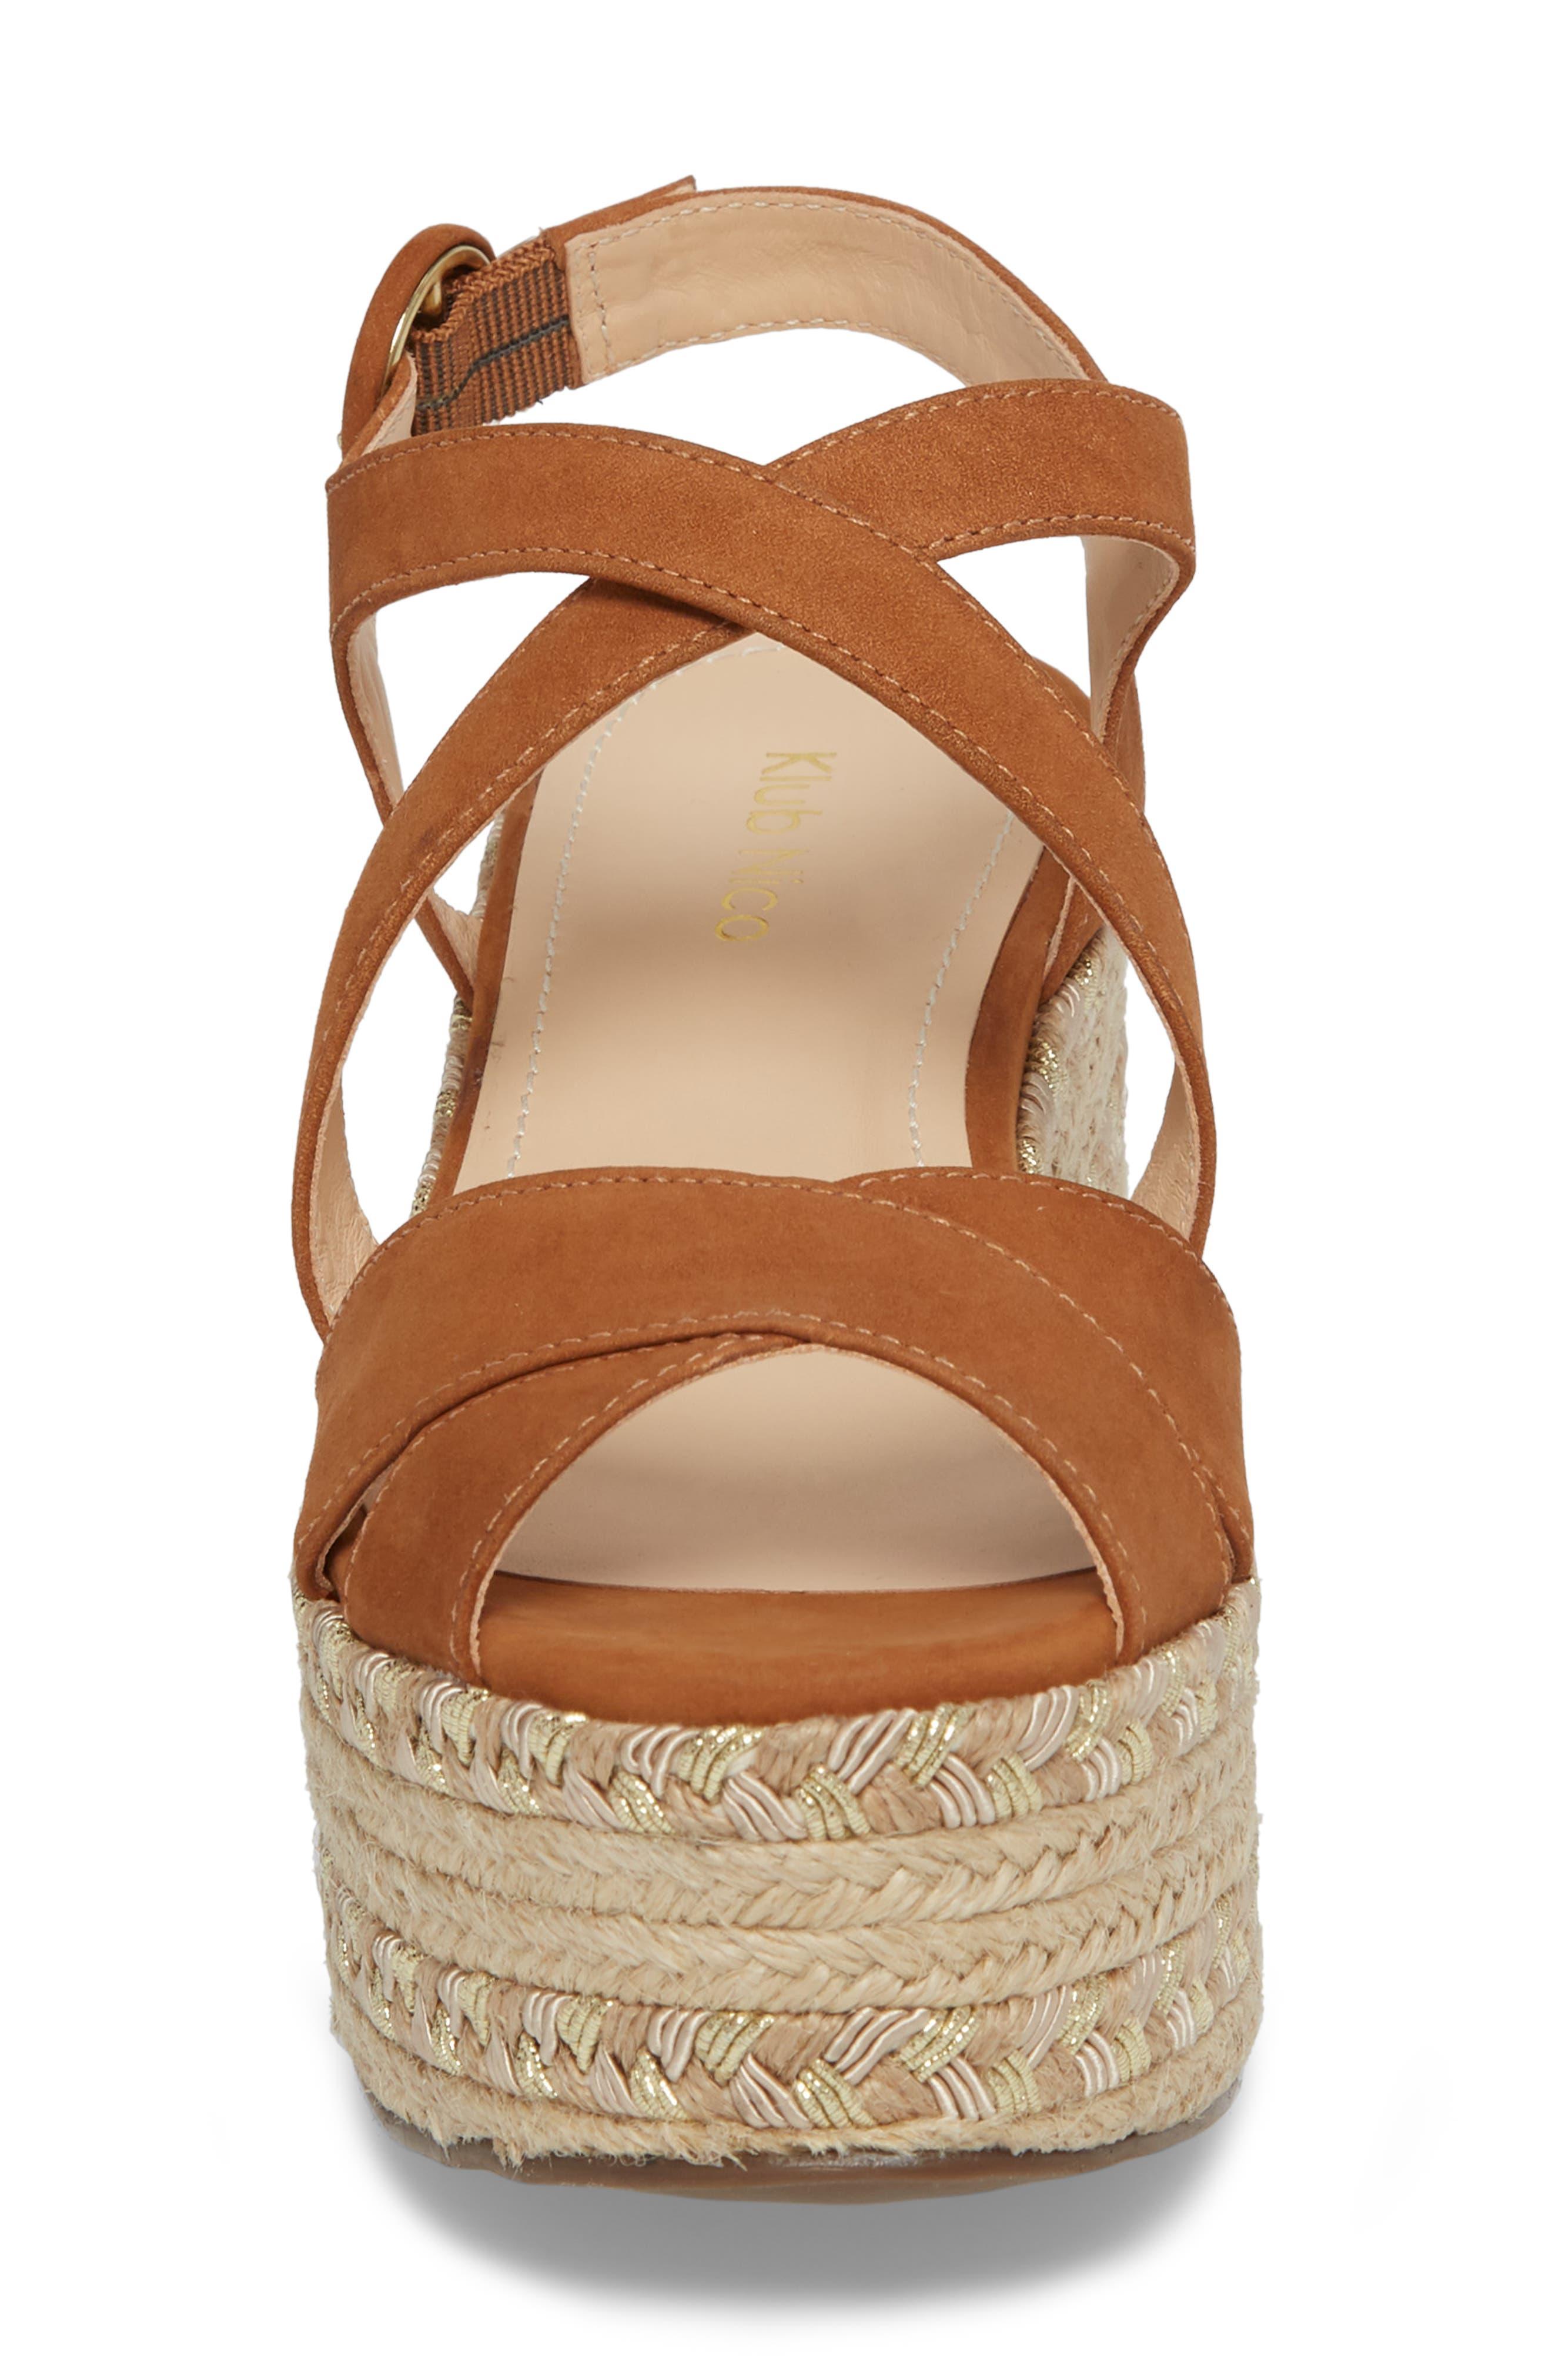 Vikki Espadrille Platform Sandal,                             Alternate thumbnail 4, color,                             Tan Leather